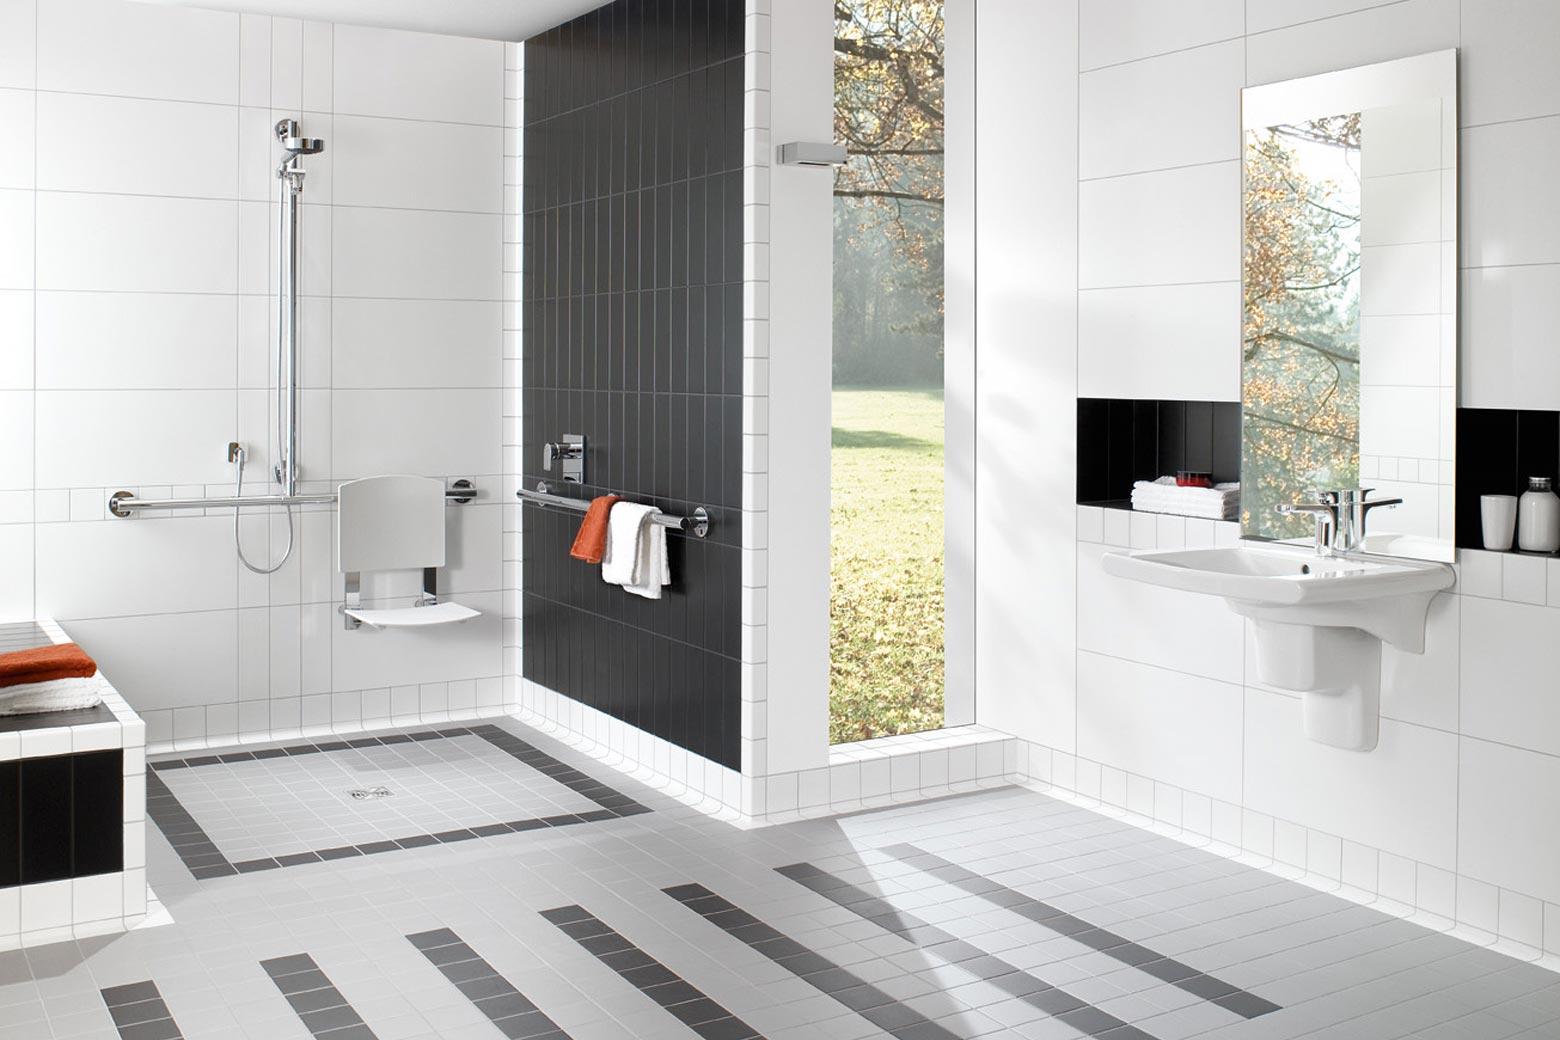 sanit r und bad f bus haustechnik bauservice gmbh co kg. Black Bedroom Furniture Sets. Home Design Ideas